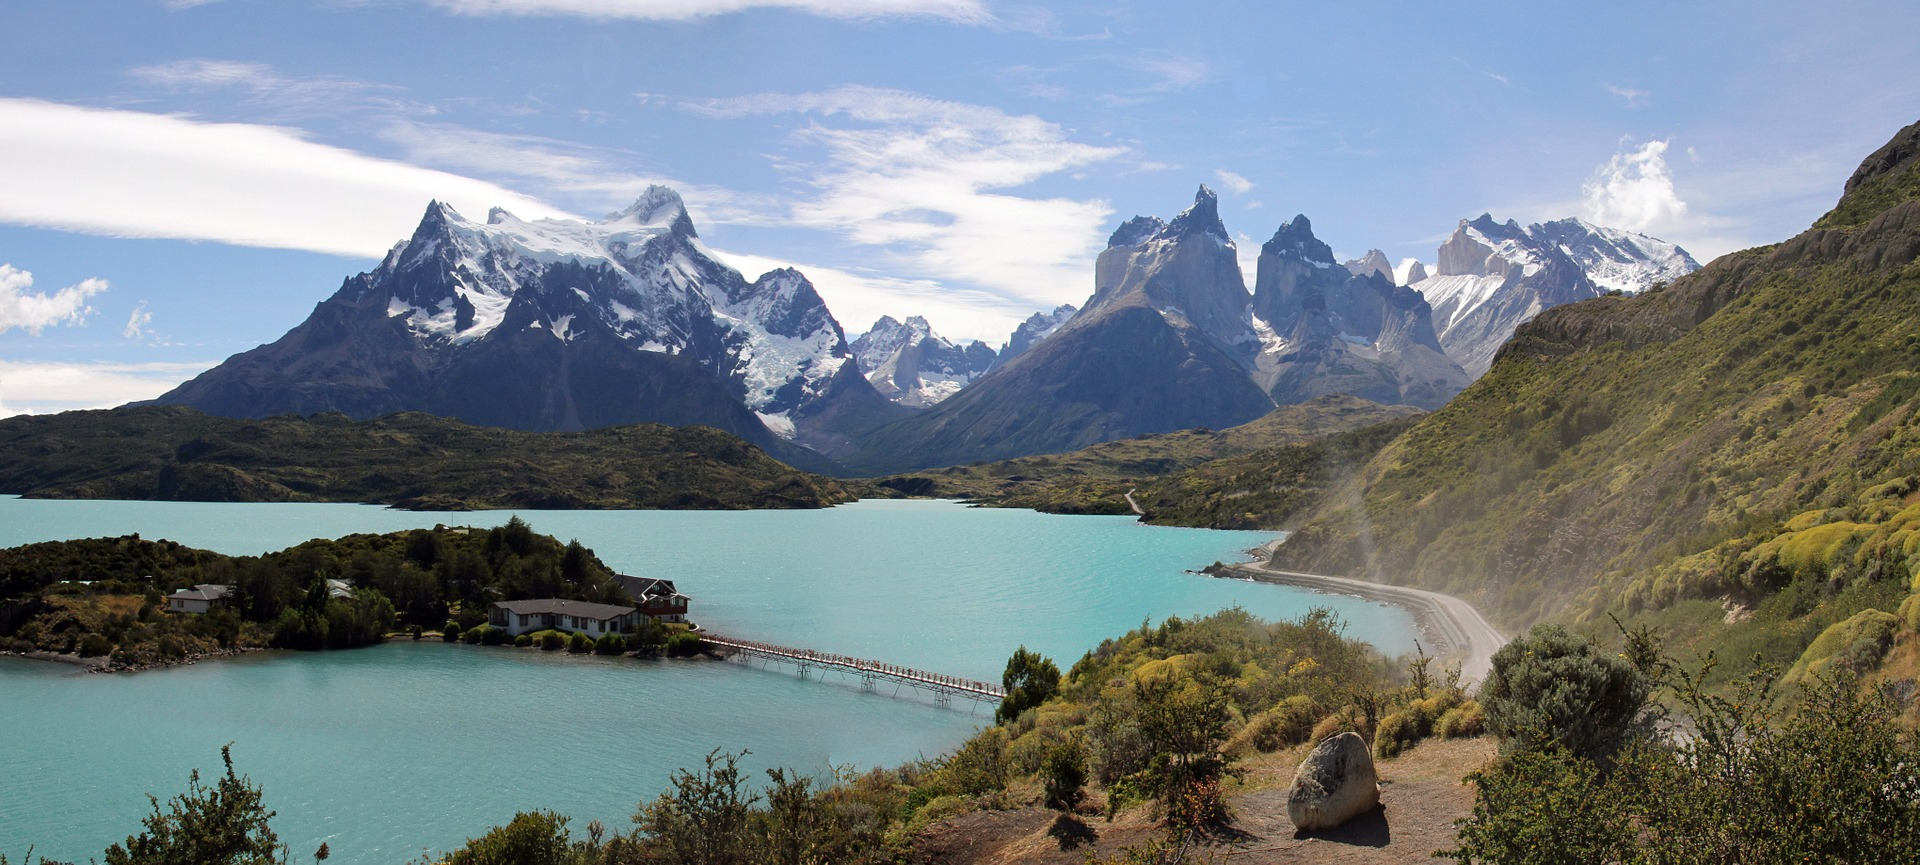 patagonia titan fleet lauren l